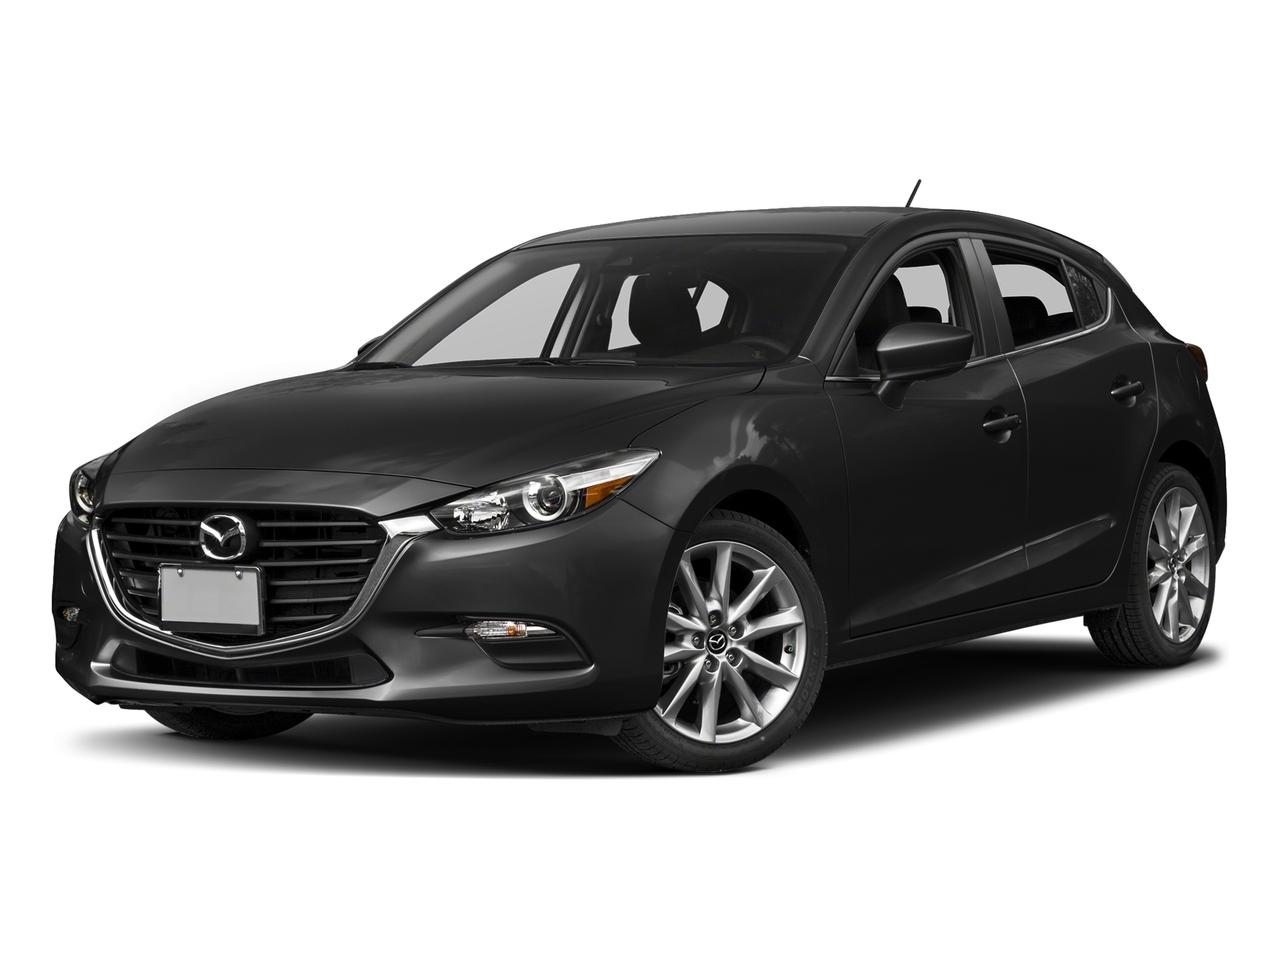 2017 Mazda3 5-Door Vehicle Photo in Appleton, WI 54913